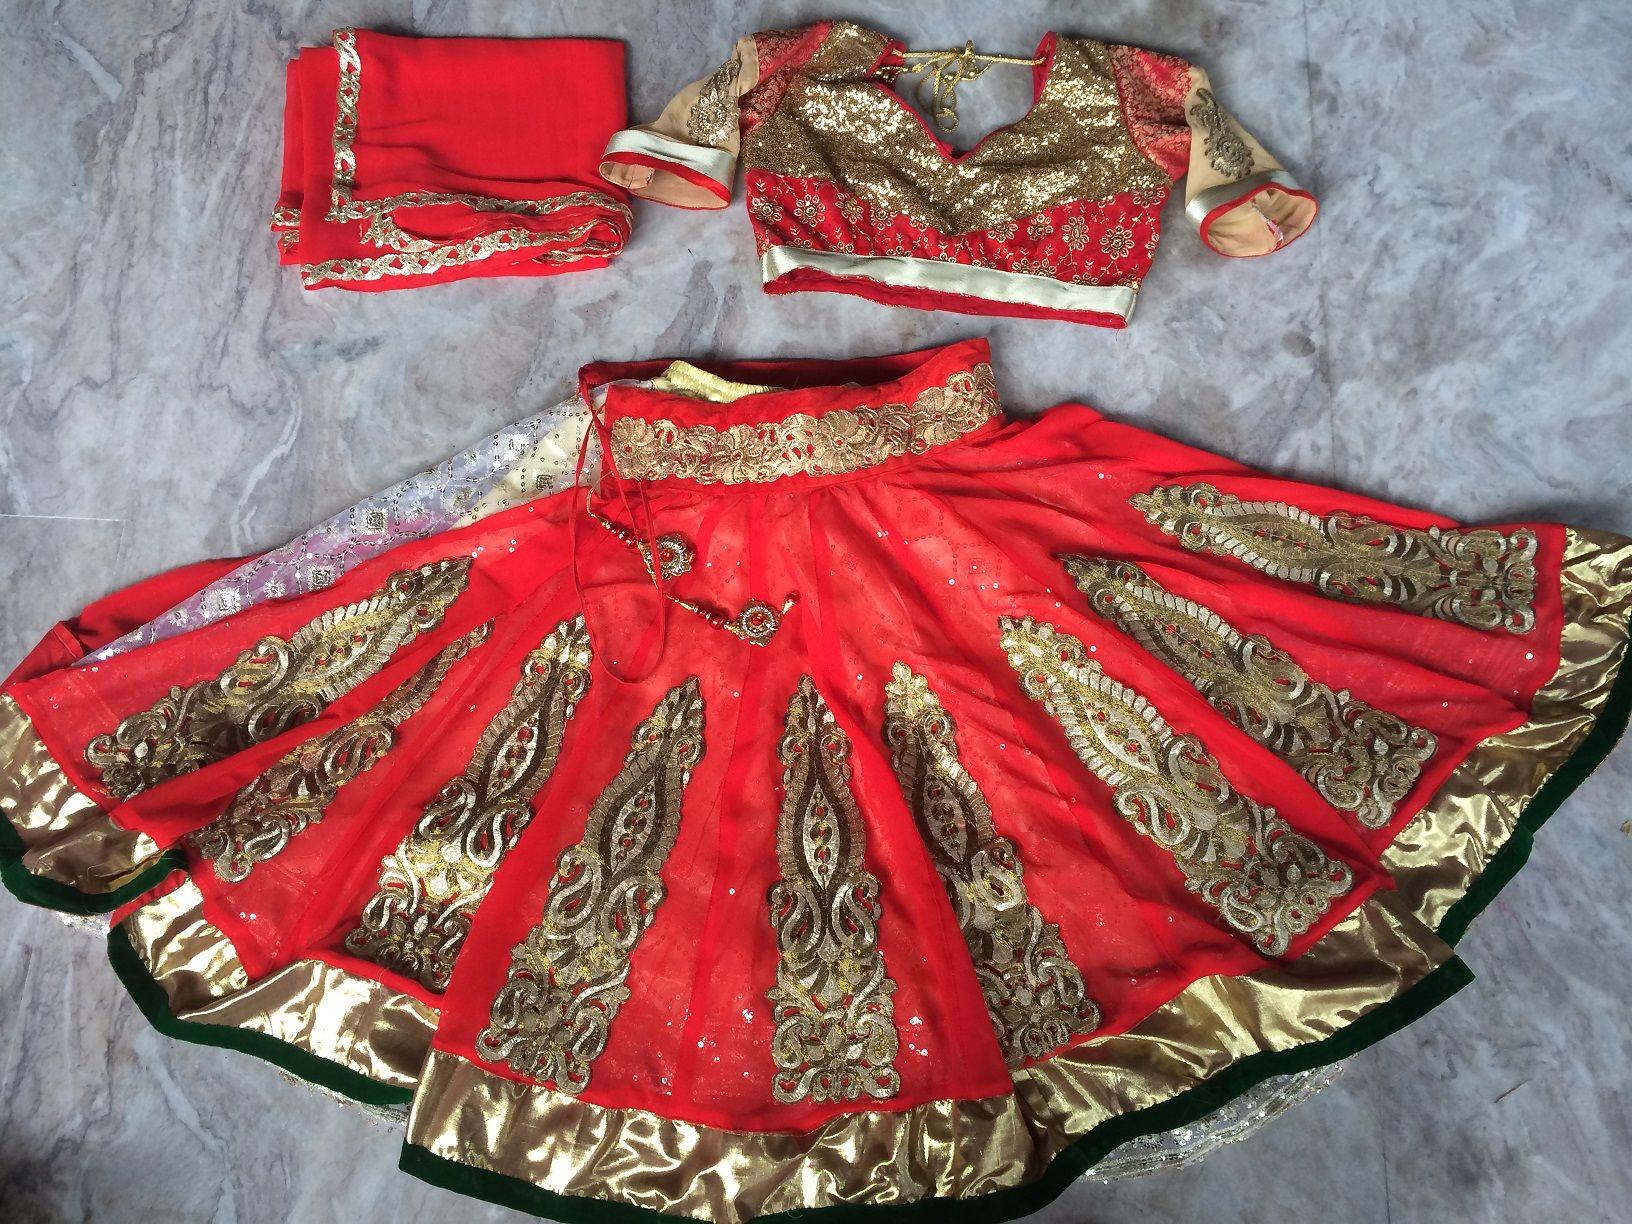 Nagada Sang Dhol Dance Dresses Dance Dresses Dresses Dance